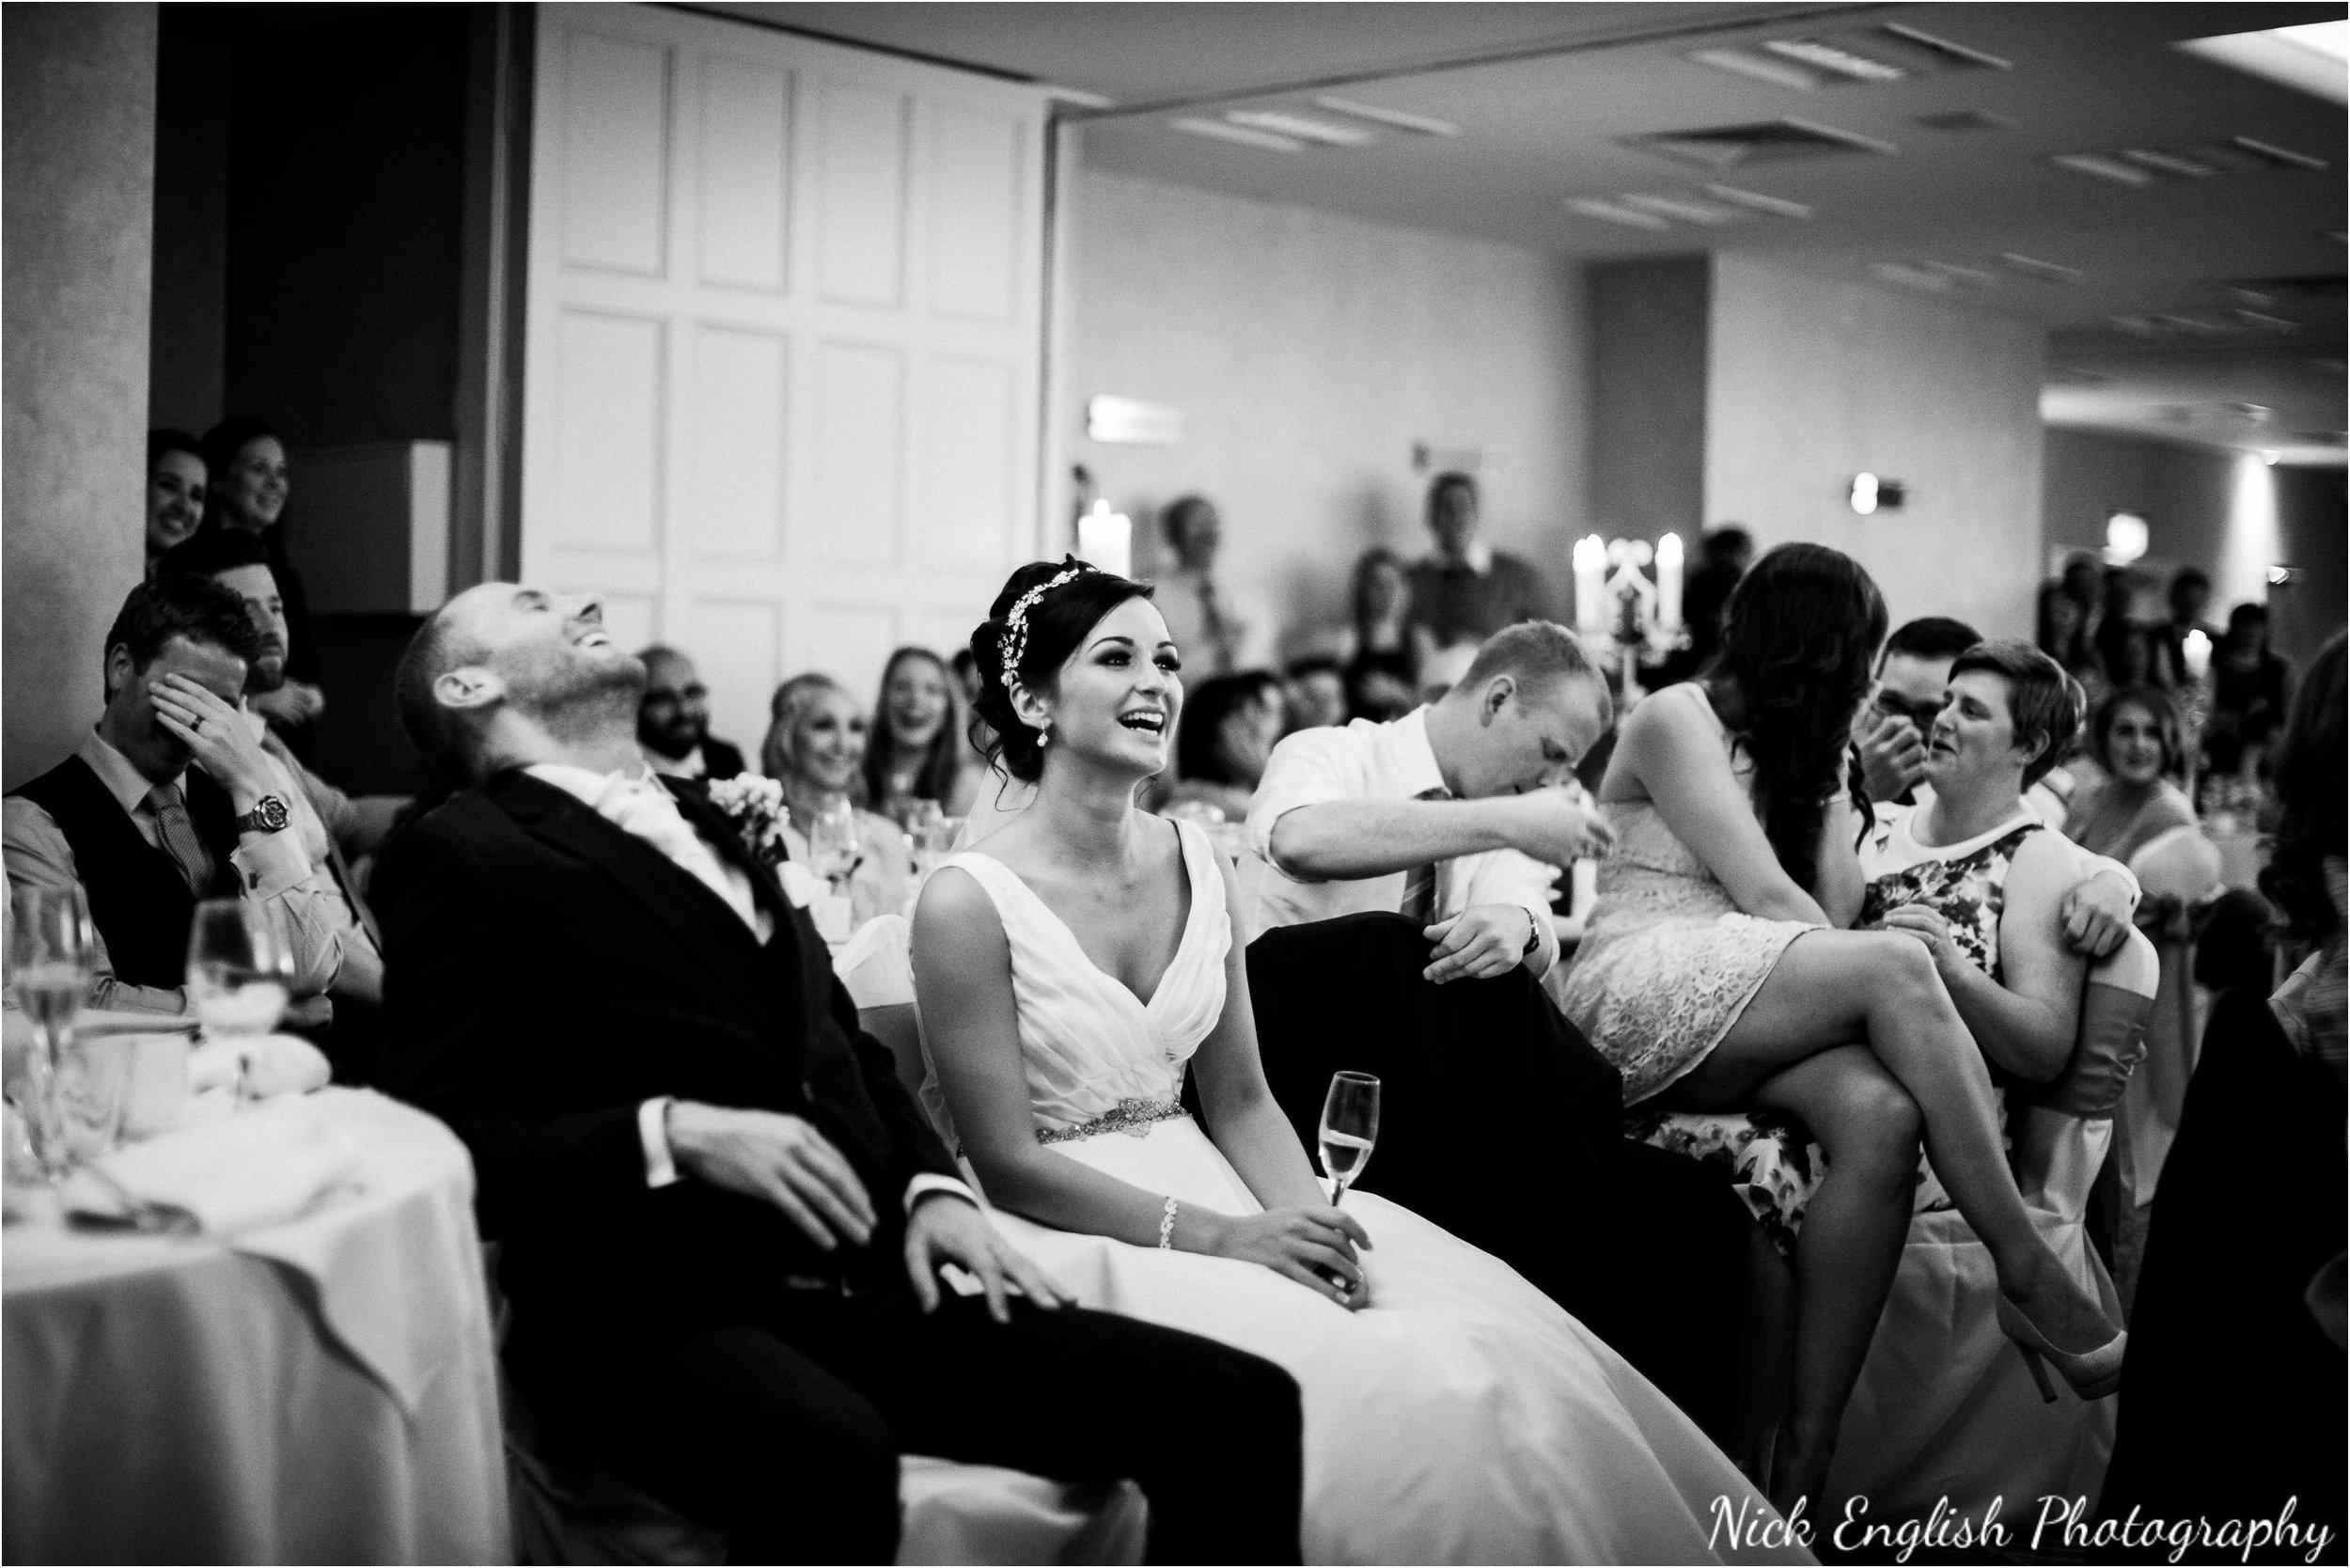 Emily David Wedding Photographs at Barton Grange Preston by Nick English Photography 187jpg.jpeg